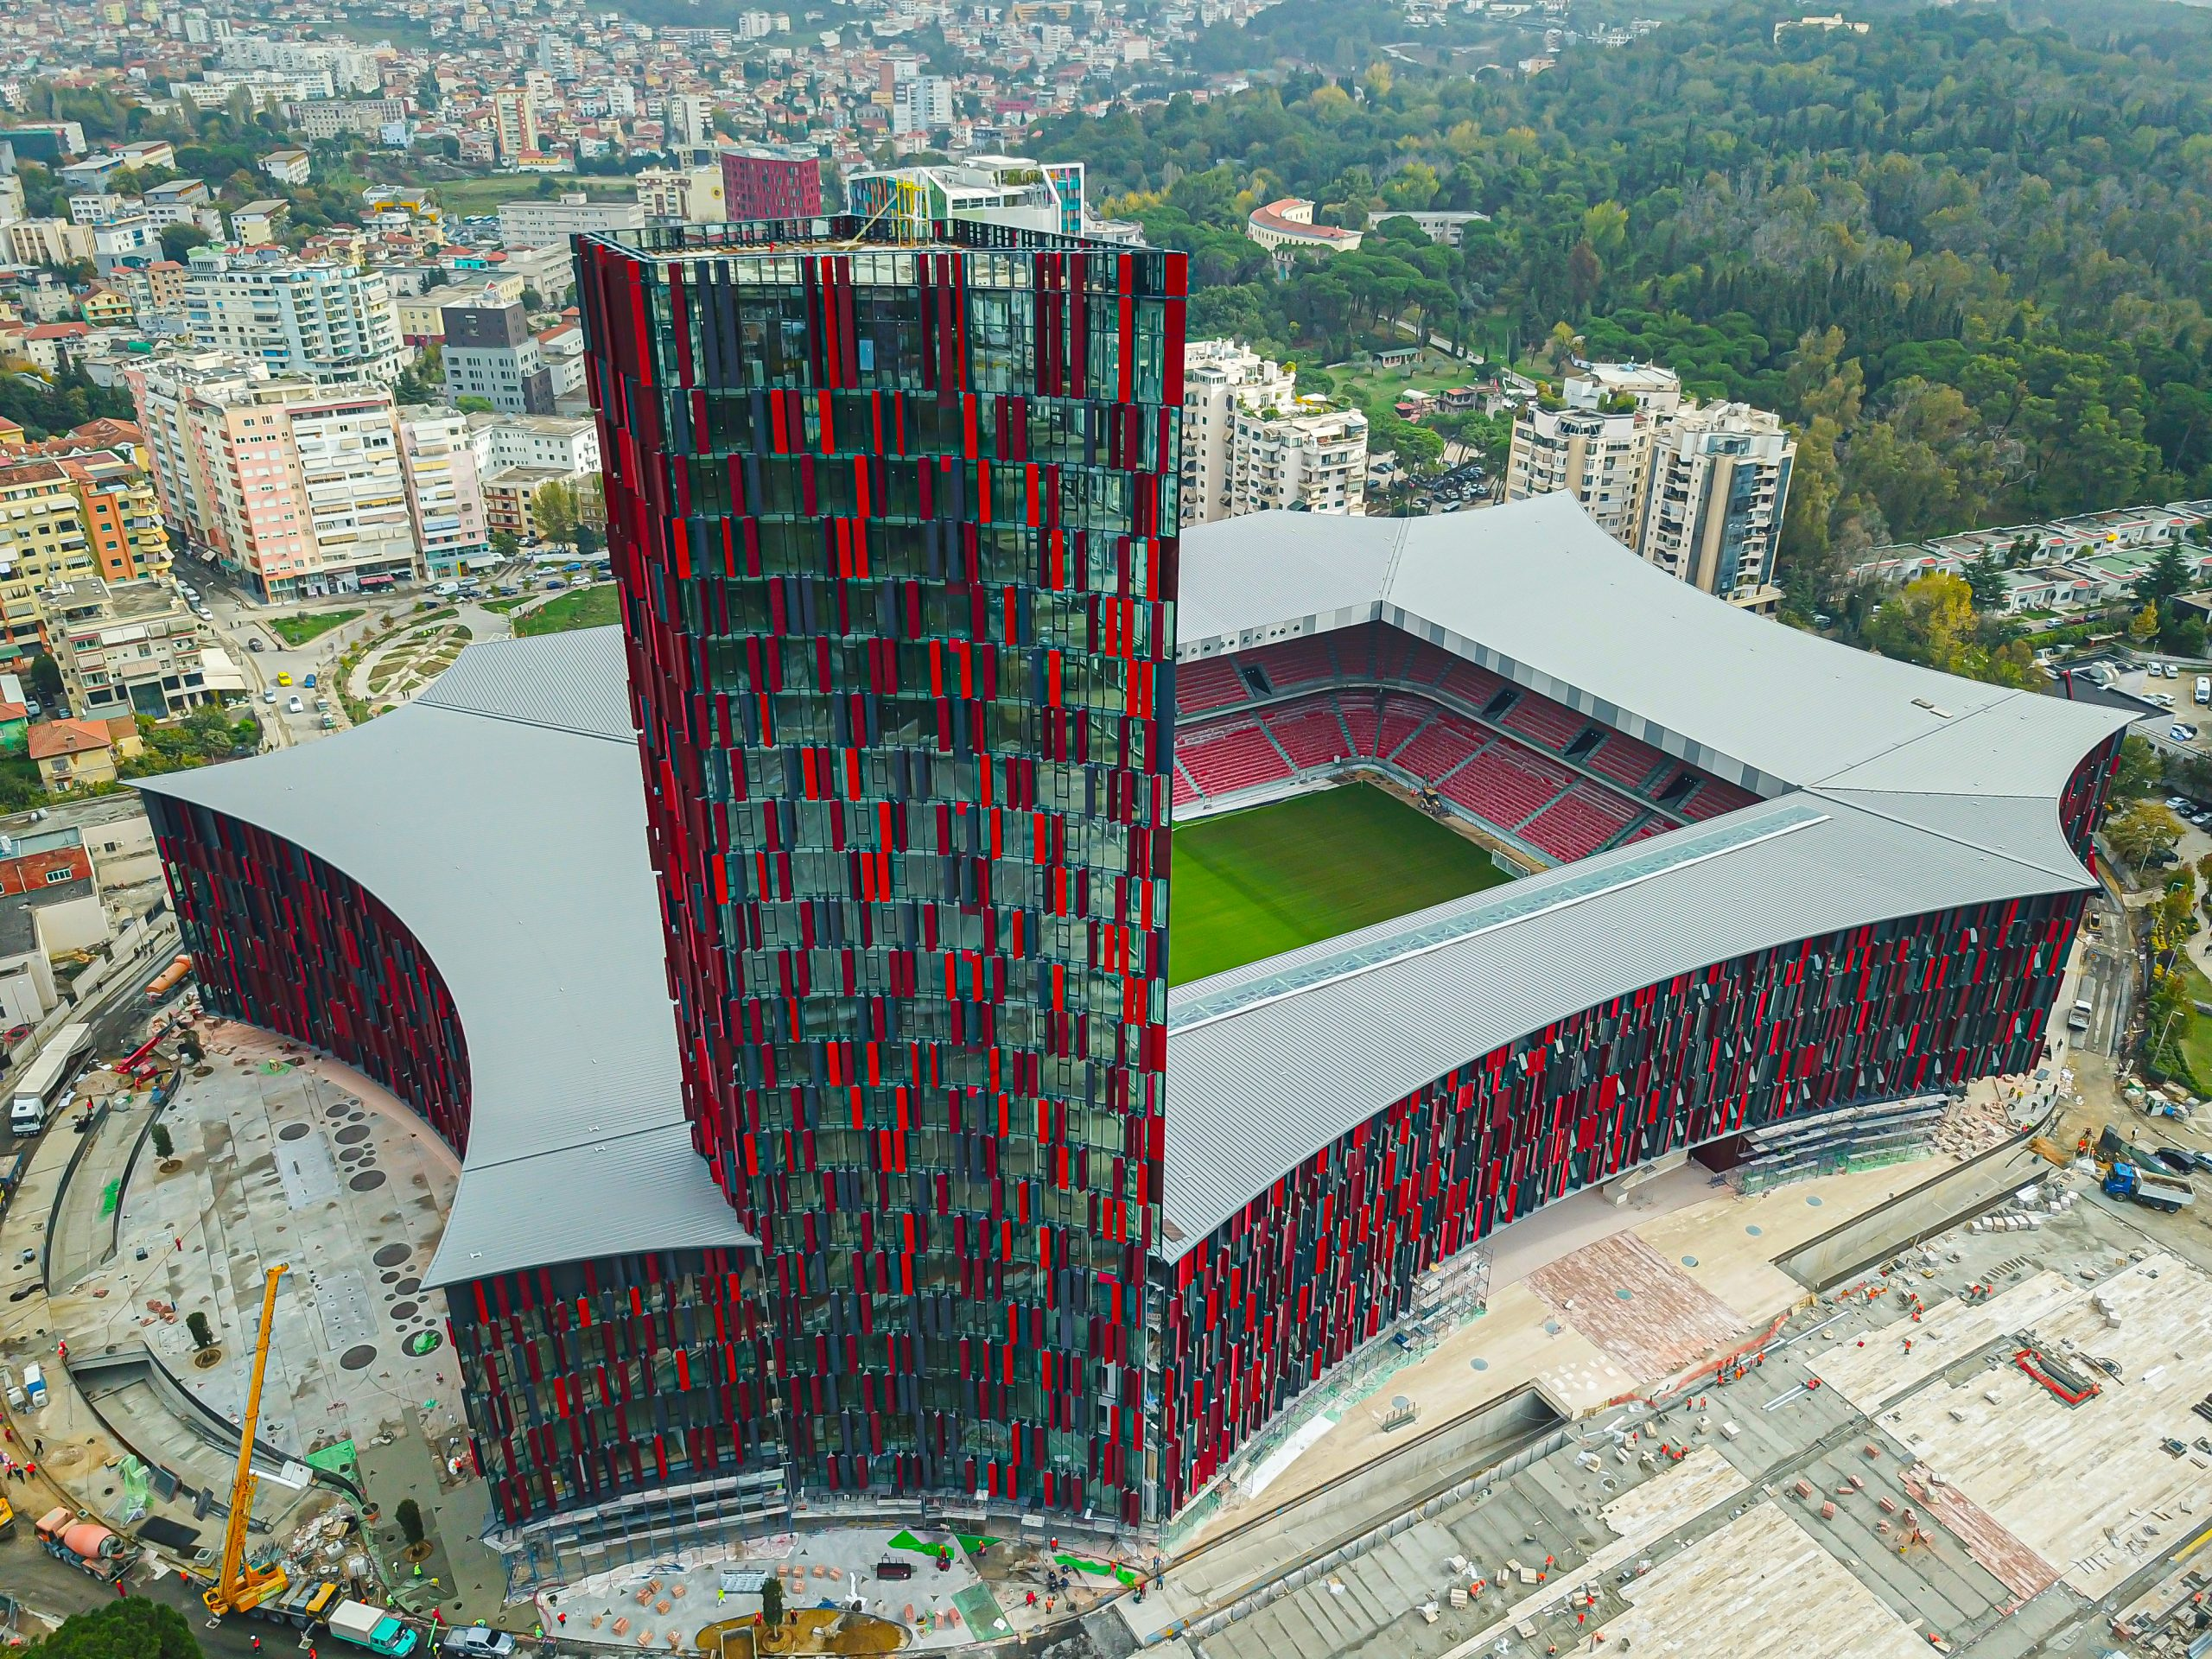 Stadiumi-Air-Albania-scaled.jpg